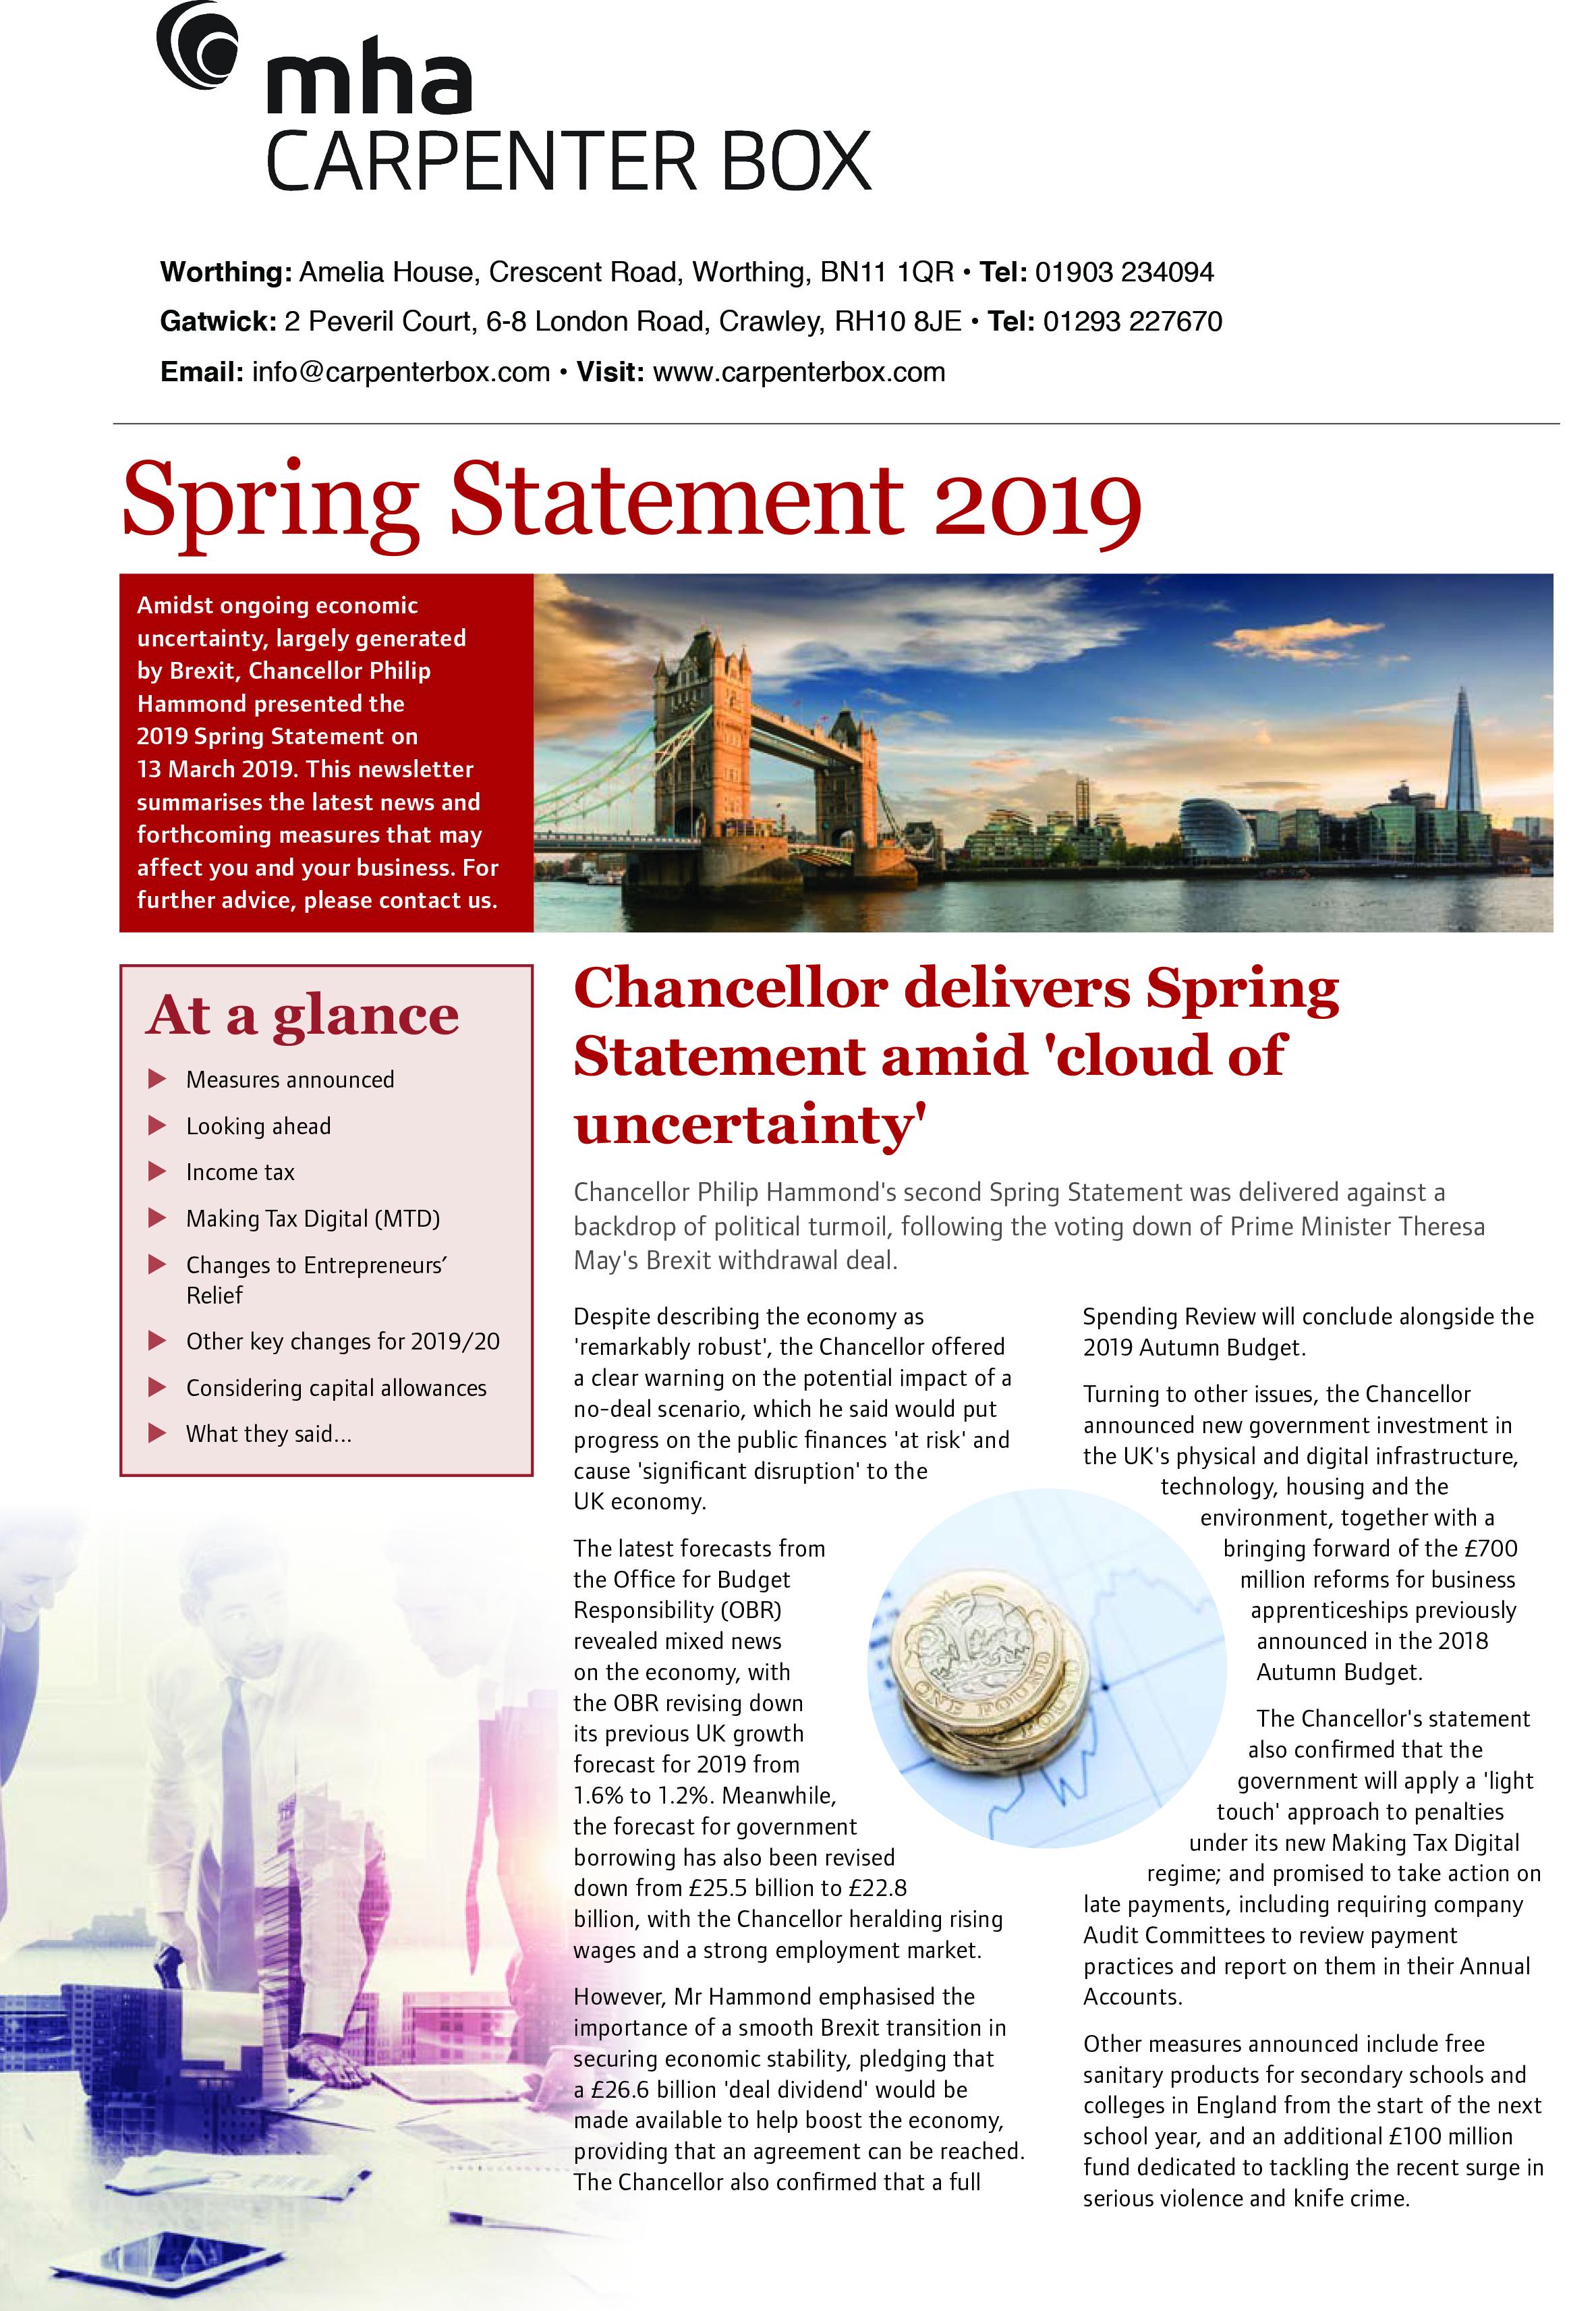 Spring Statement 2019 | MHA Carpenter Box